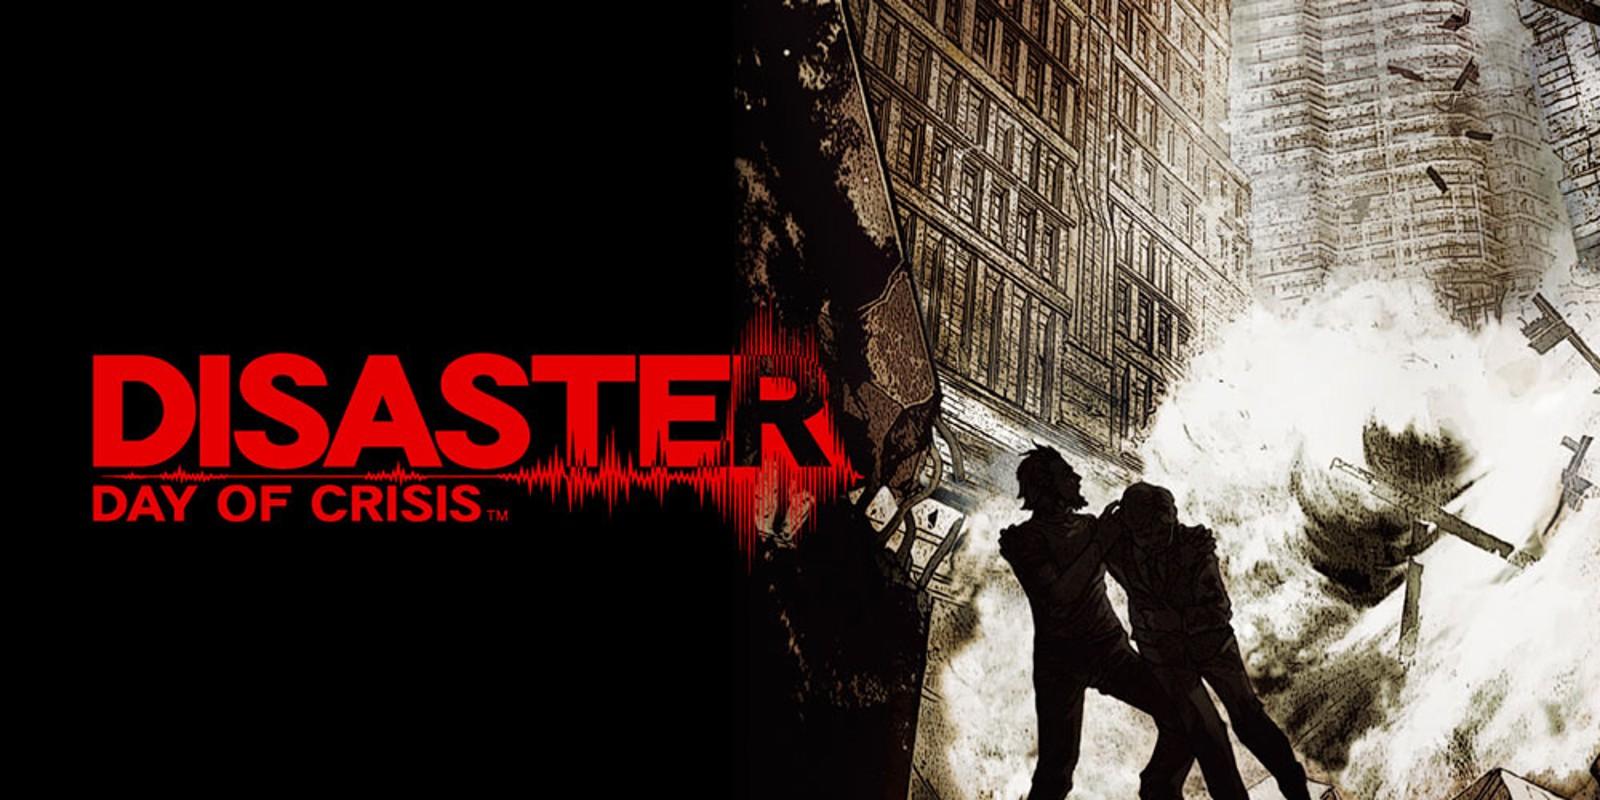 SI_Wii_DistasterDayOfCrisis_image1600w.j